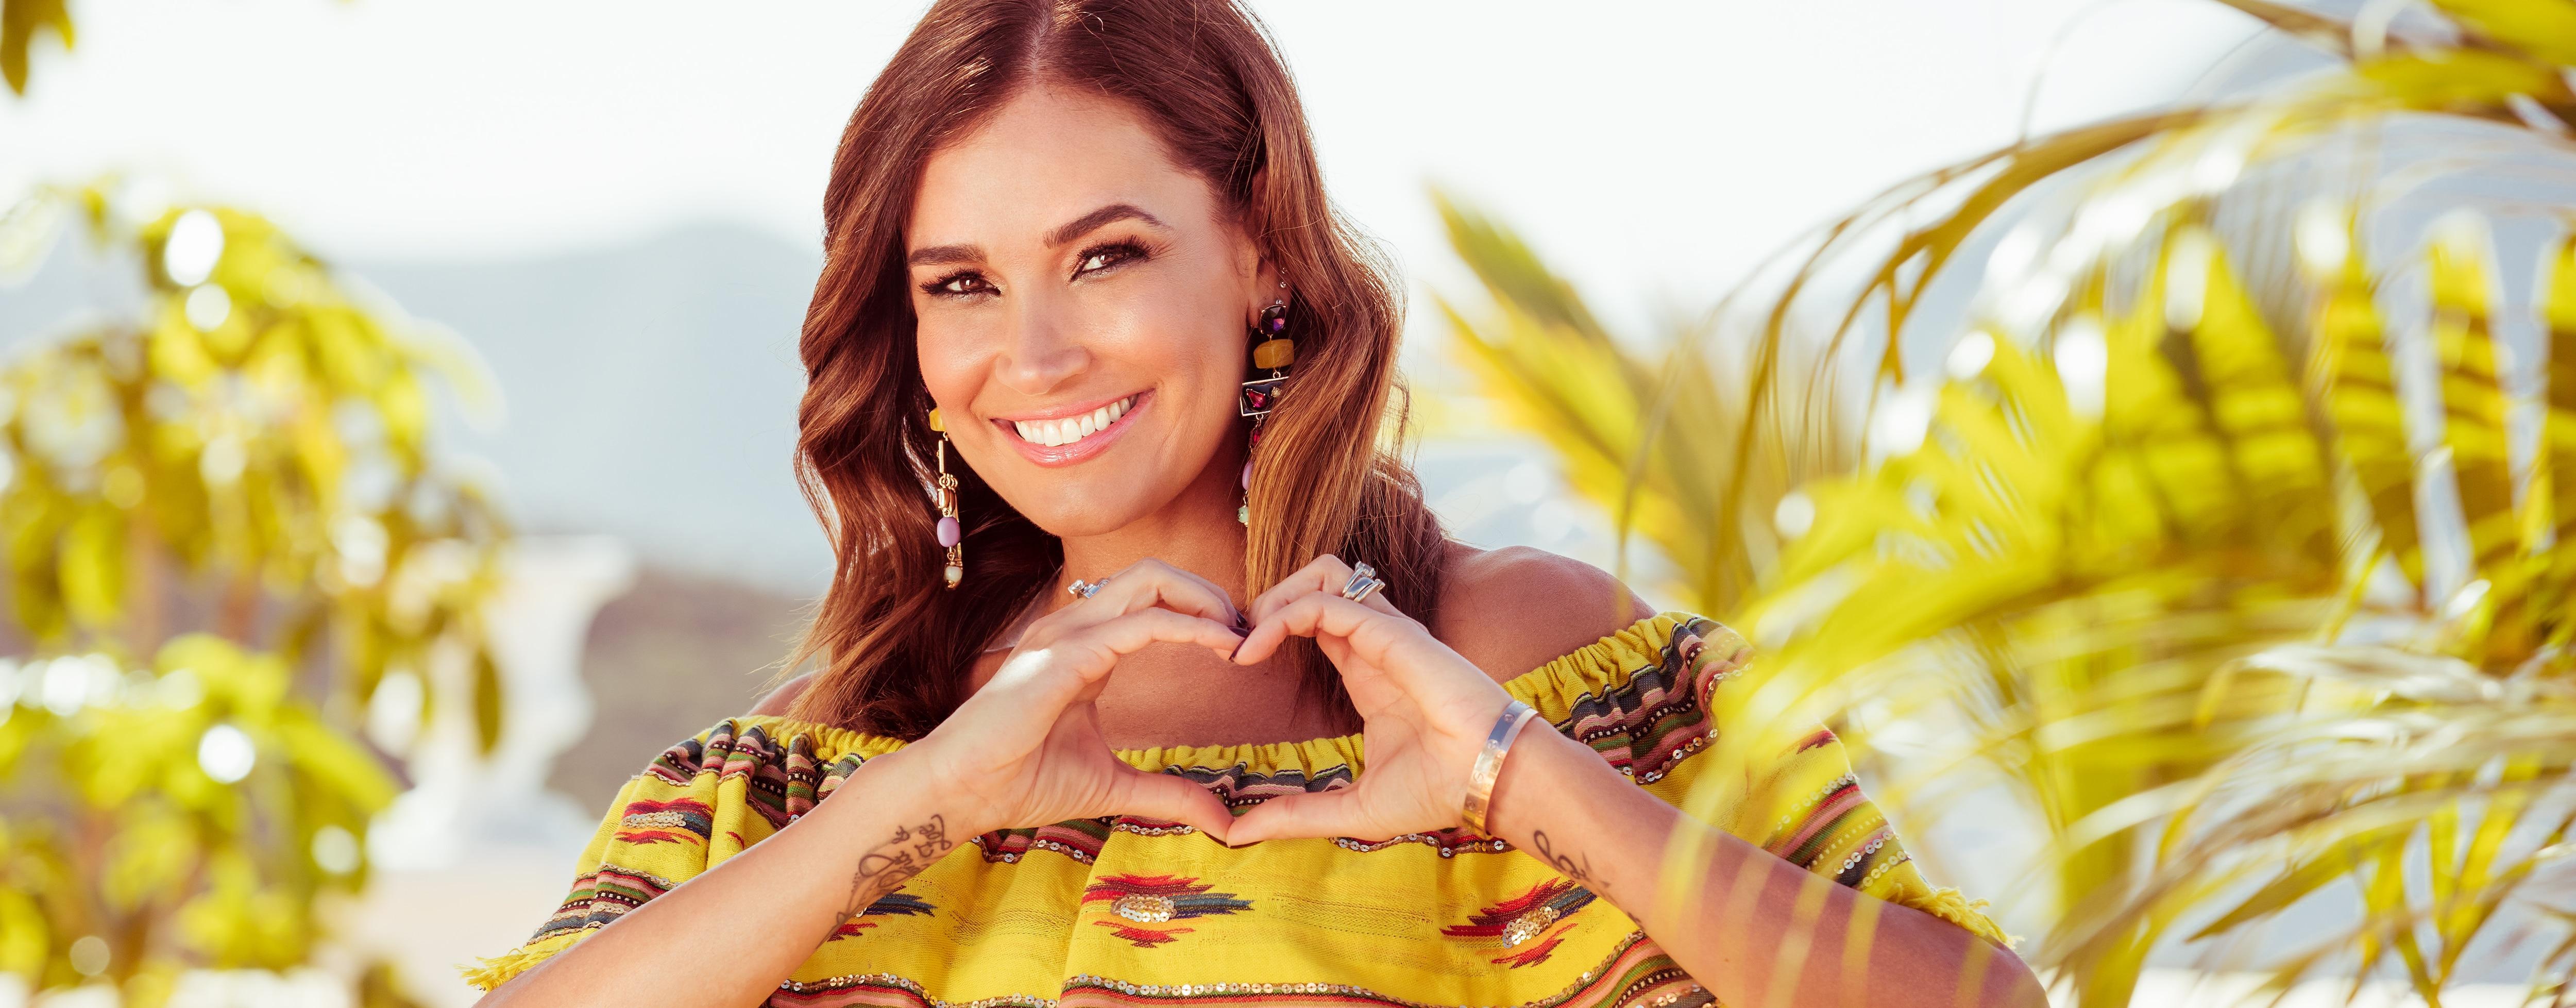 Love Island 2: Ab September bei RTL II